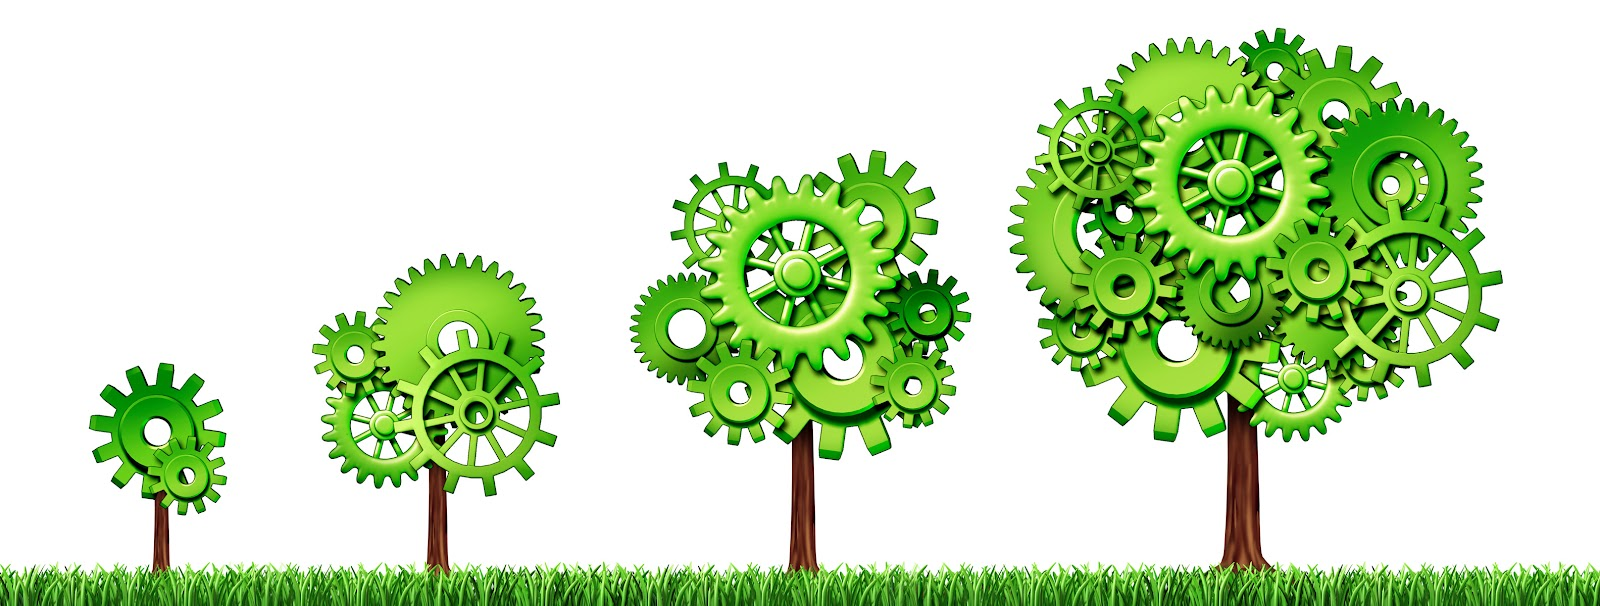 ... Acct, CFA, MBA: Green Economy dalam Konsep Pembangunan Berkelanjutan